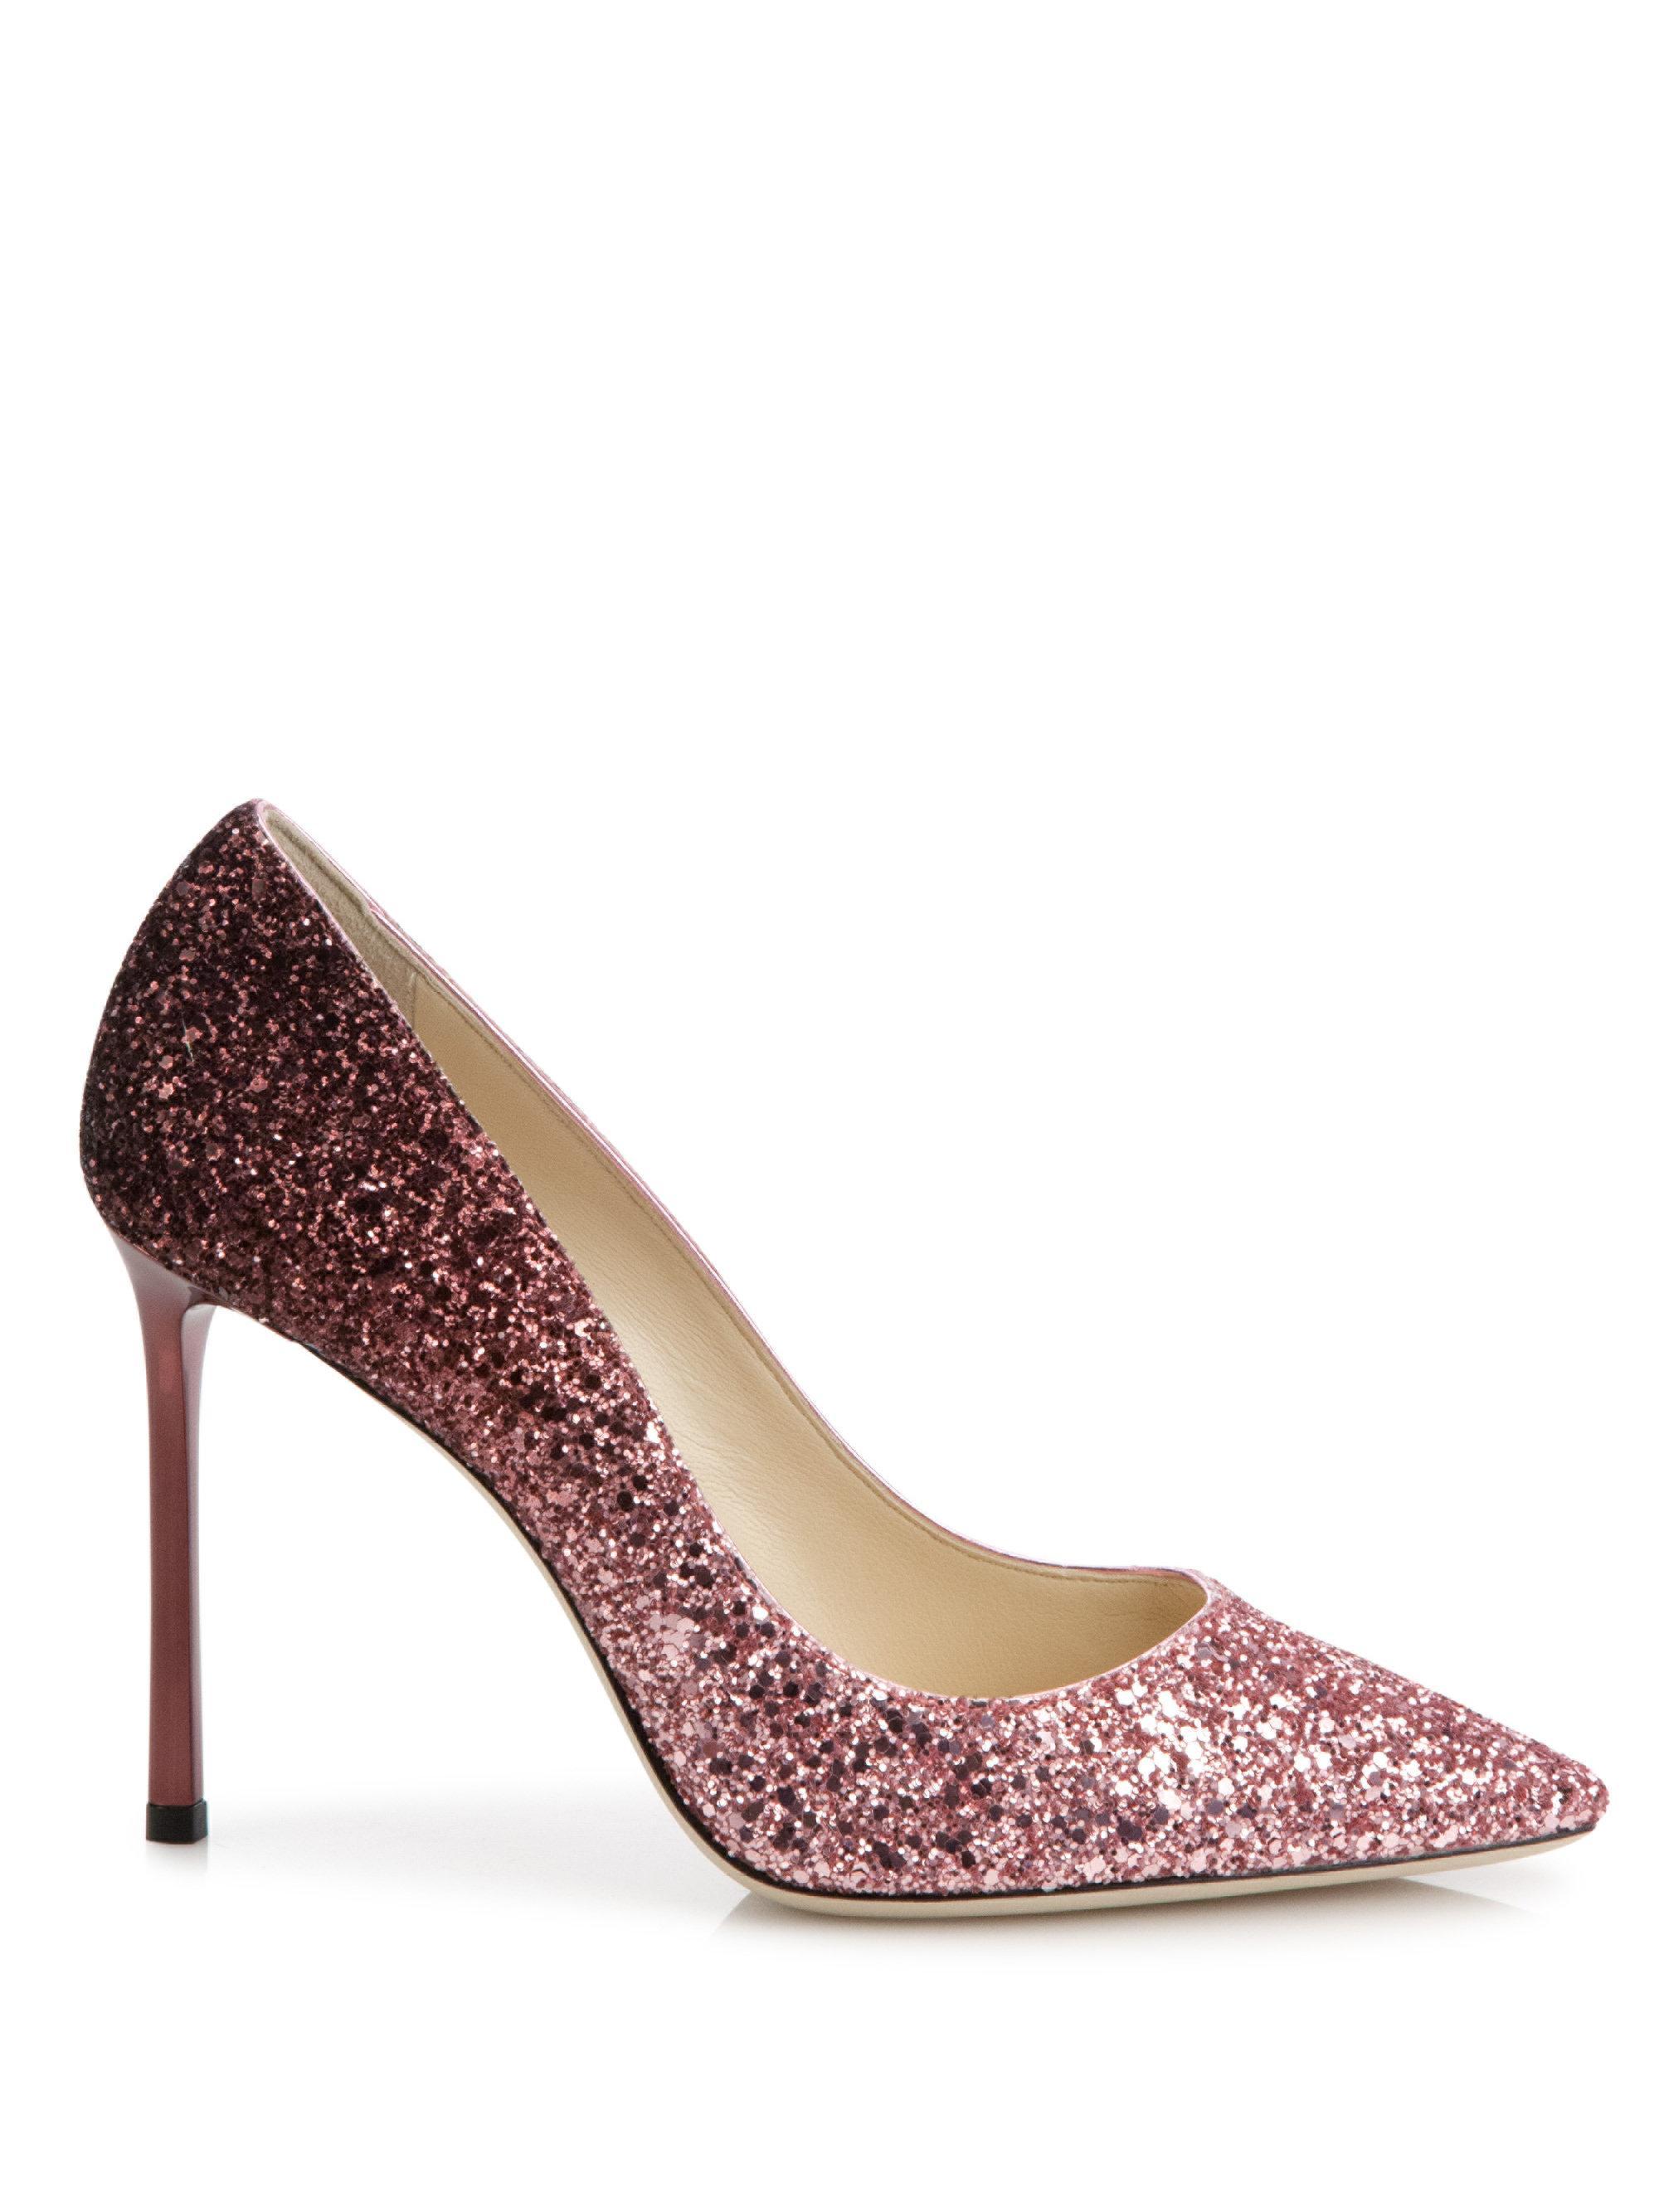 69e2c88bb08 ... clearance romy degrad glittered leather point toe flats baby pink jimmy  choo london 6d69b ecb31